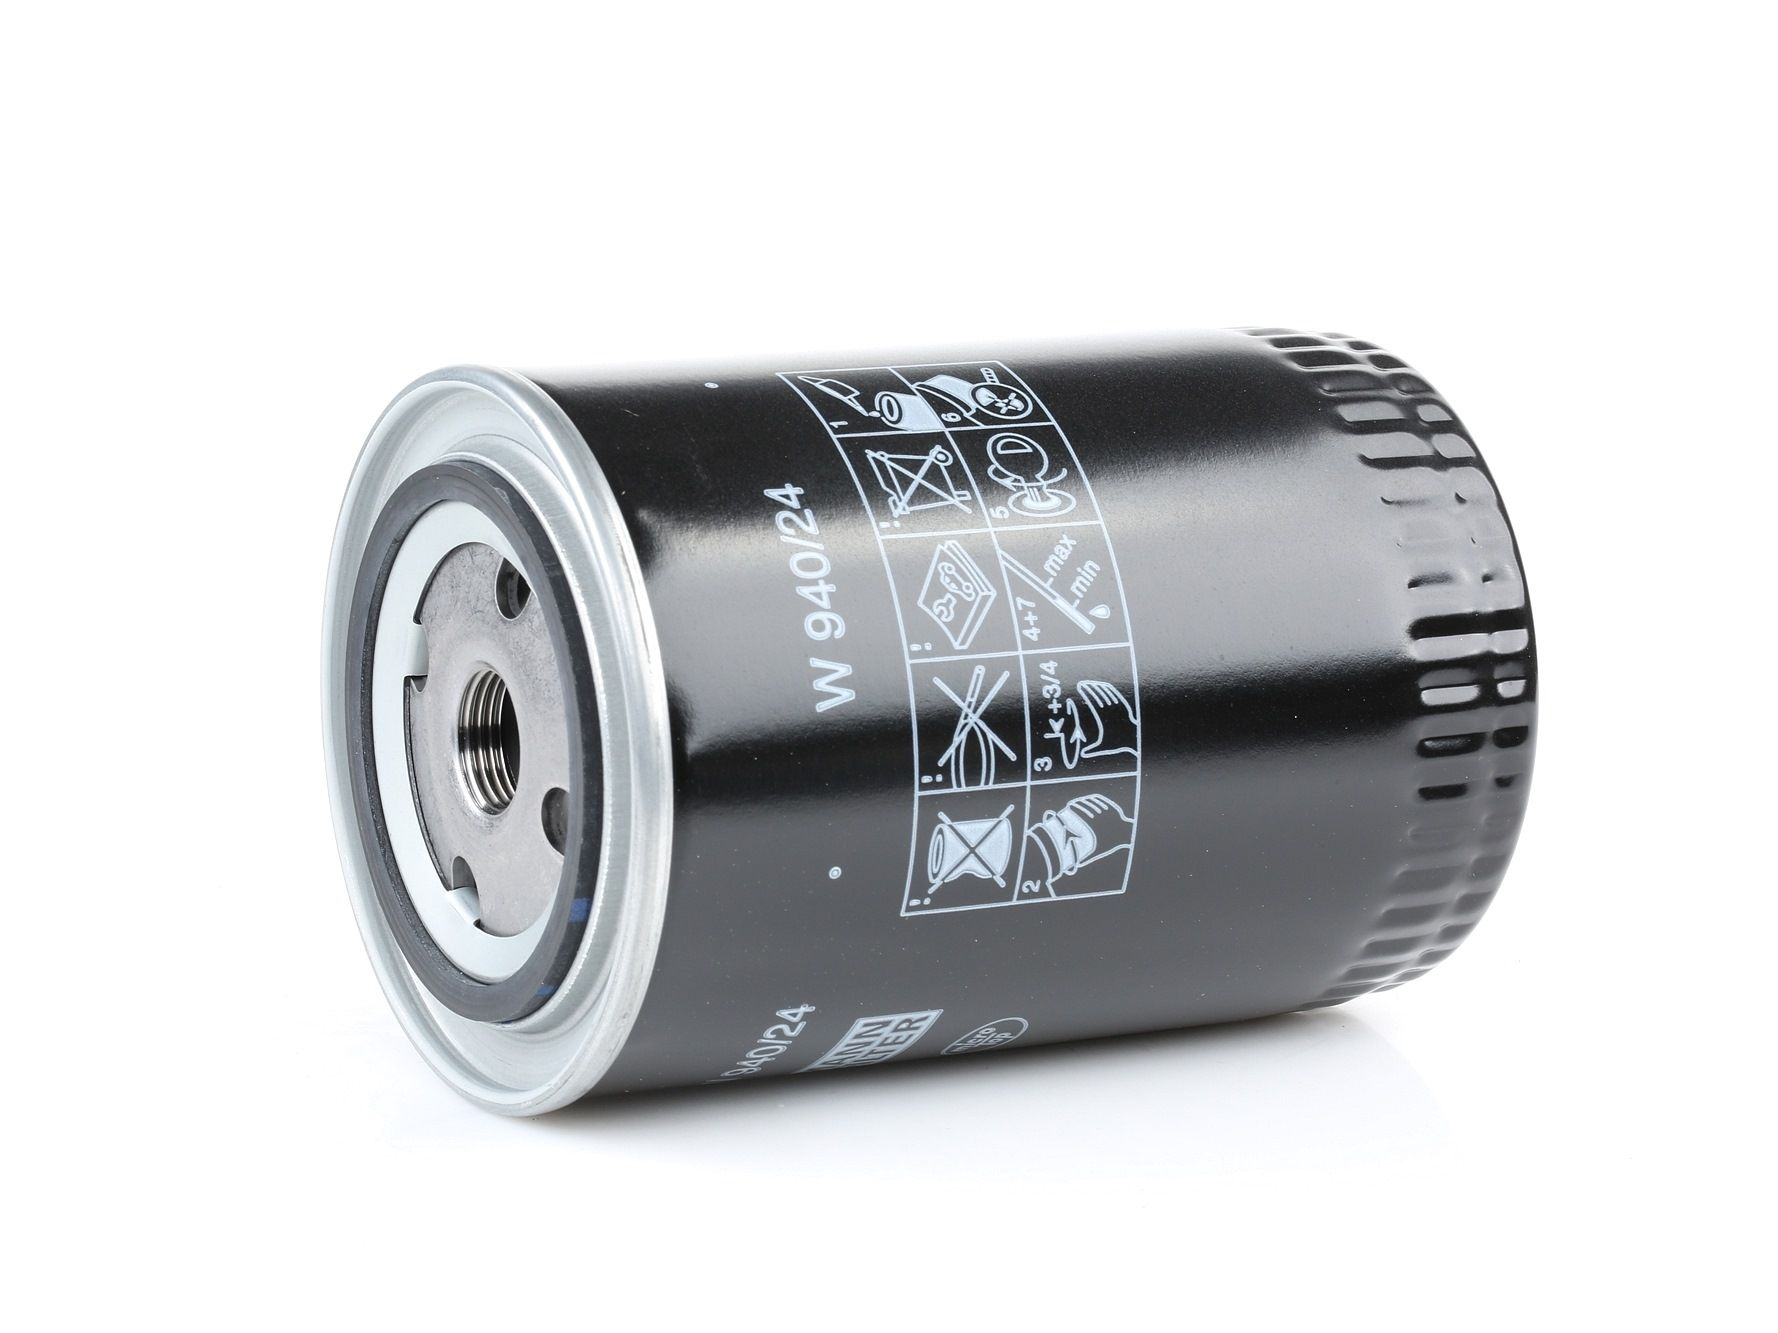 MANN-FILTER: Original Ölfilter W 940/24 (Innendurchmesser 2: 62mm, Innendurchmesser 2: 62mm, Ø: 93mm, Außendurchmesser 2: 71mm, Höhe: 142mm)